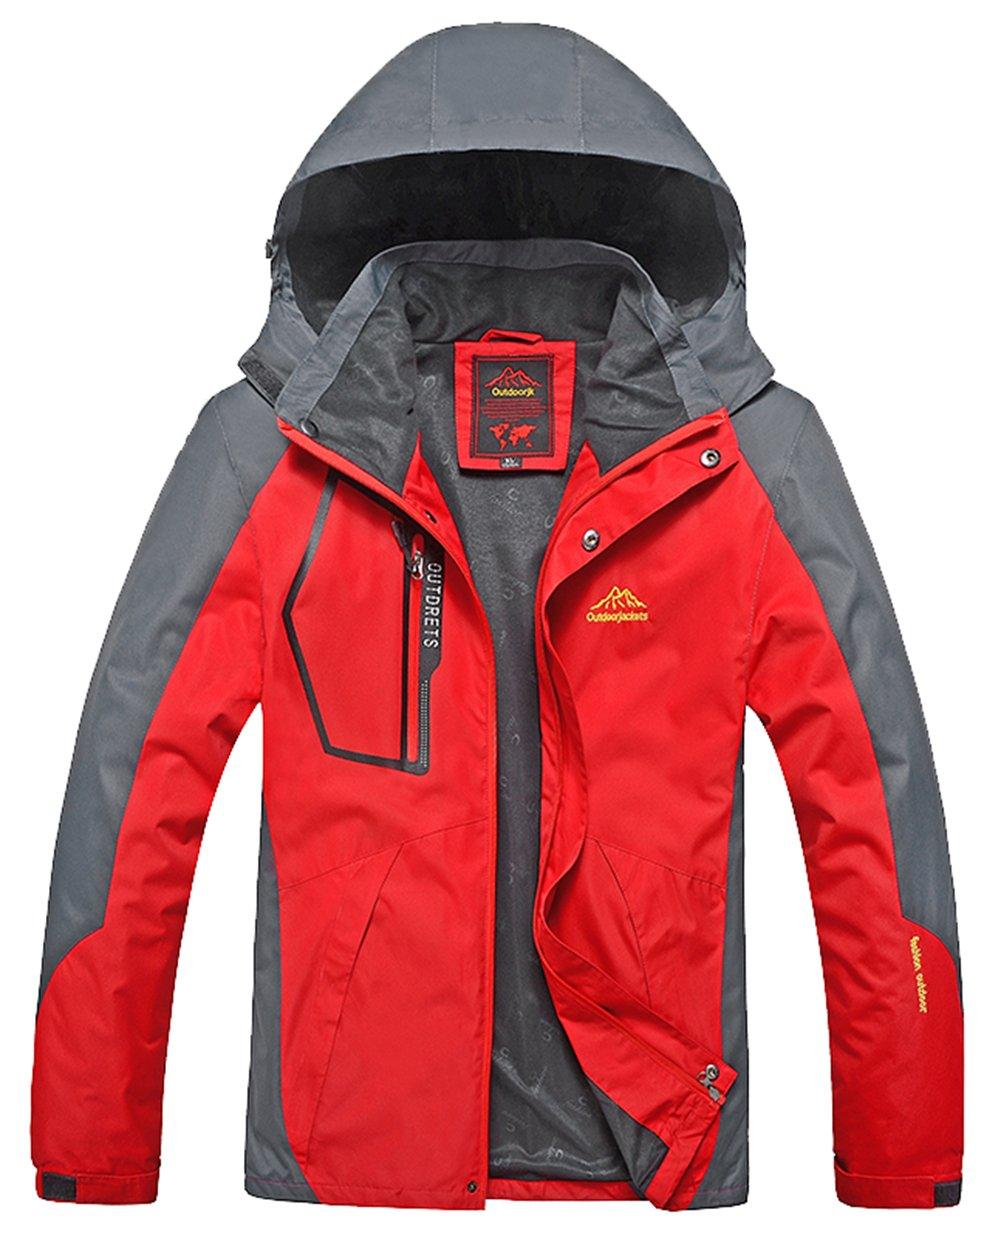 Lottaway Spring Fall Hooded Outdoor Hiking Climbing Rush Guard Pioneer Jacket Faddist Spark Malls-CA